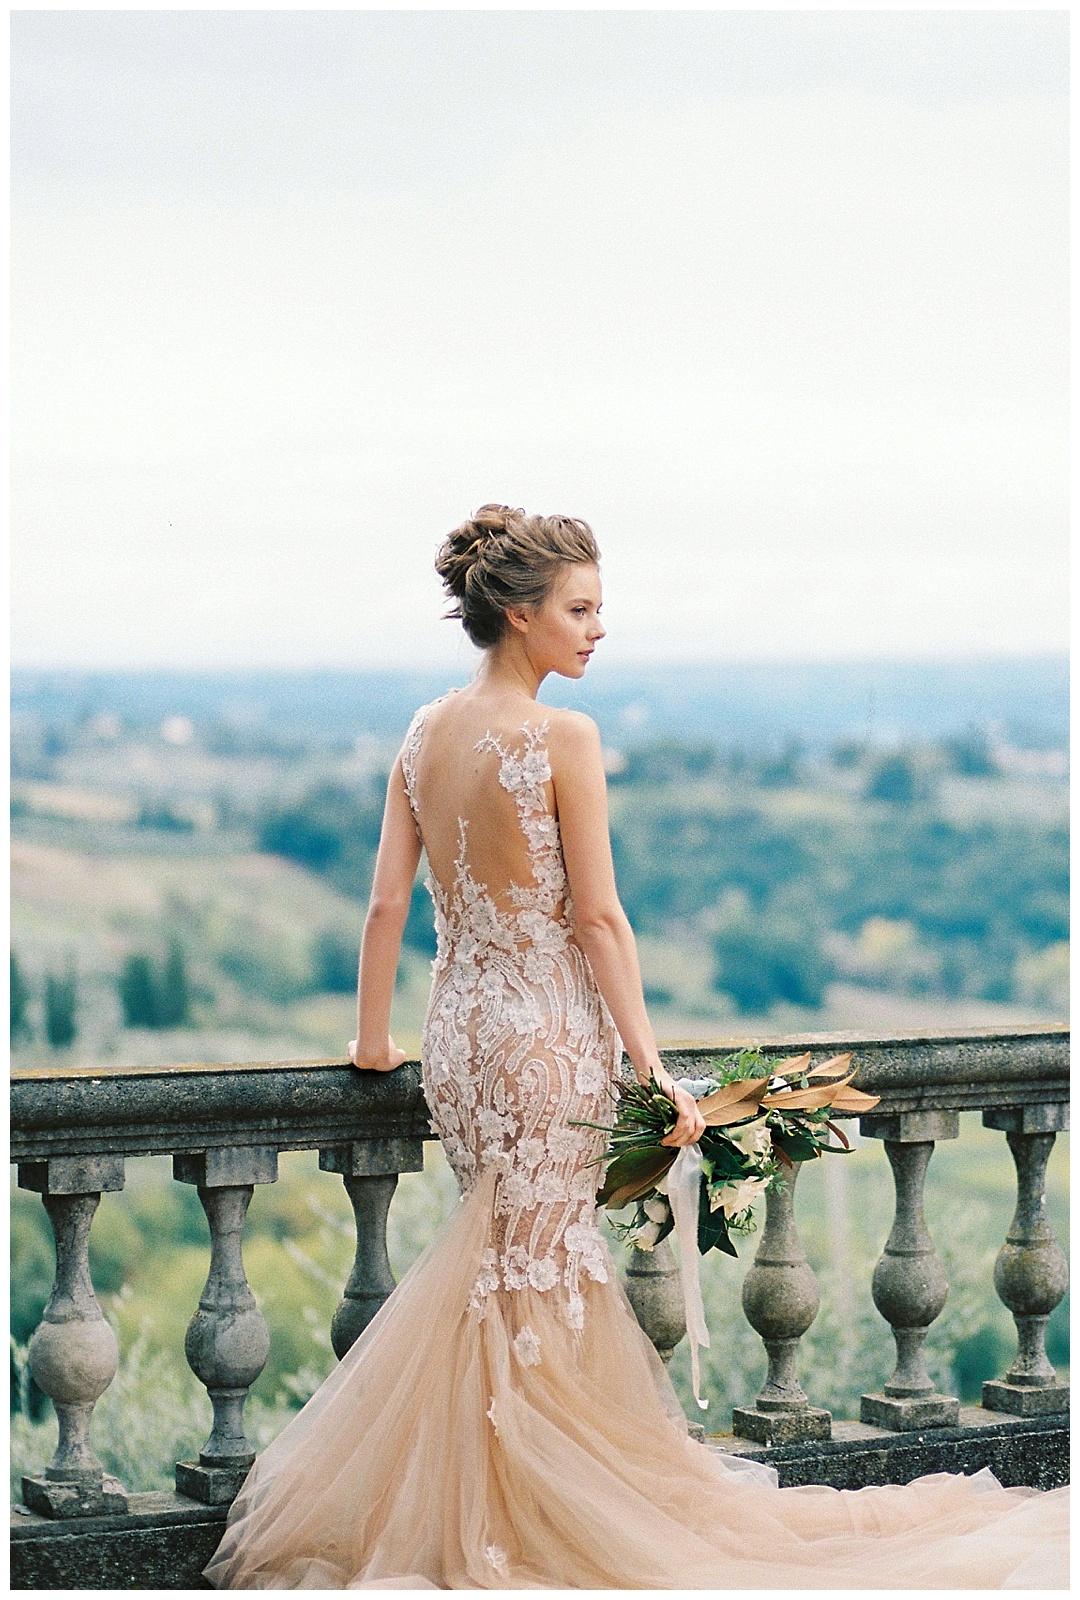 We_Can _Be_Heroes_alternative_wedding_photographer_Tuscany_wedding_film_0046